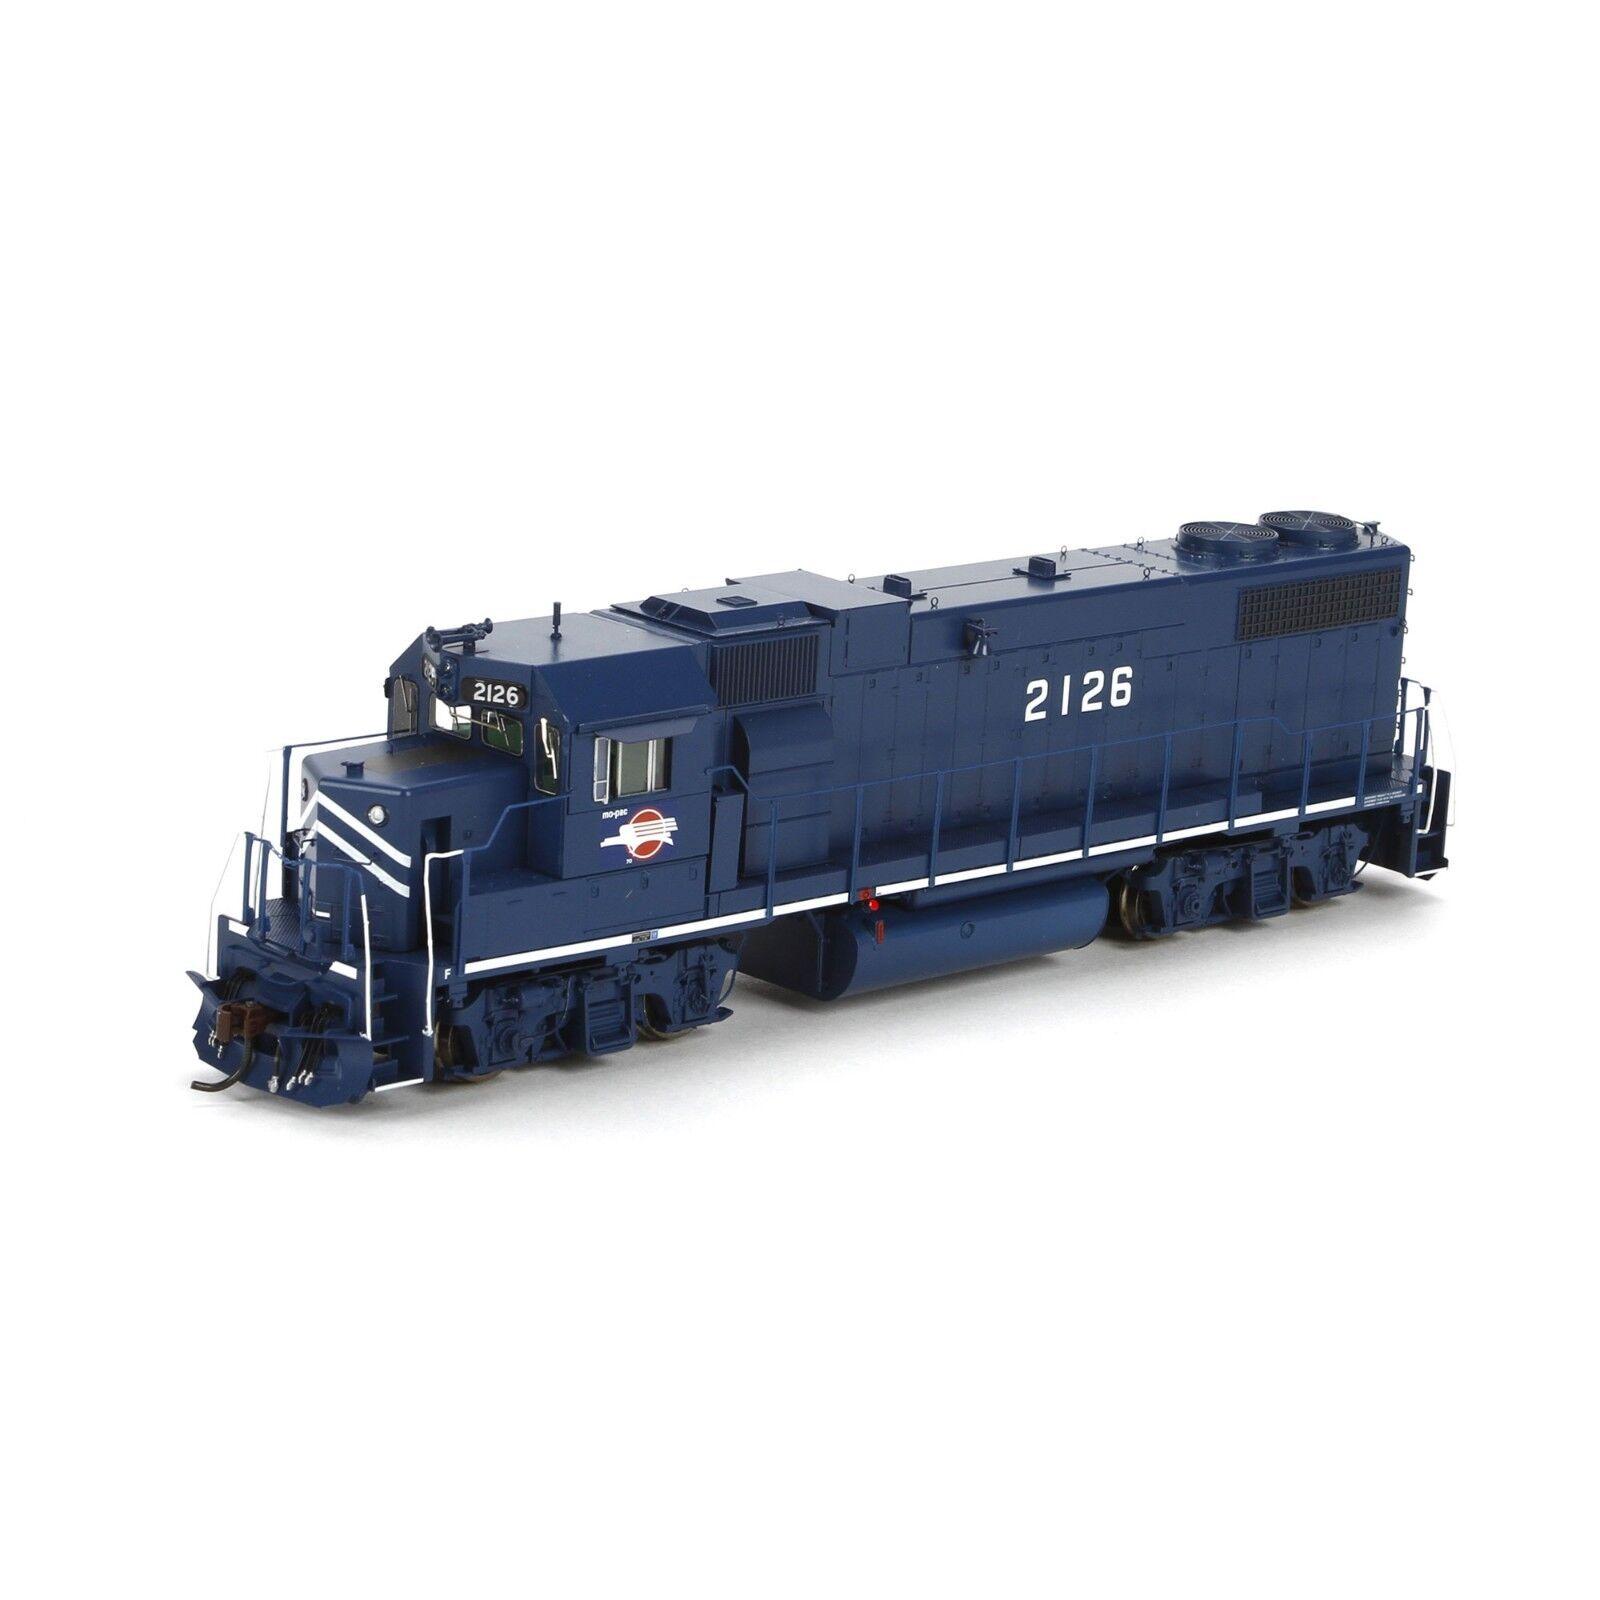 HO Scale GP38-2 Locomotive w/Sound - Missouri Pacific  2126 - Athearn  G40607